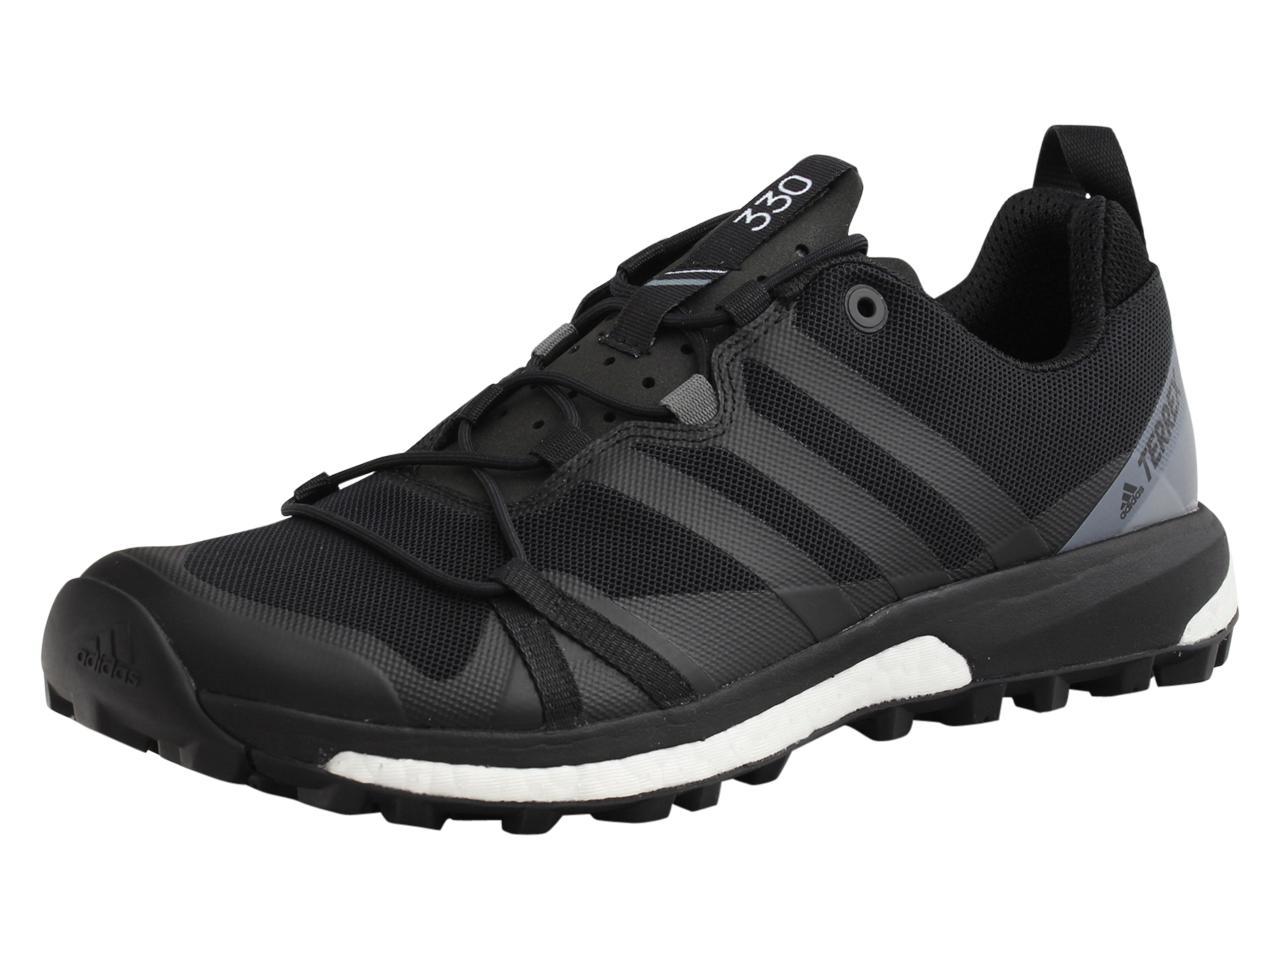 newest 044e3 8ce2f Adidas Mens Terrex-Agravic All-Terrain Trail Running Sneaker